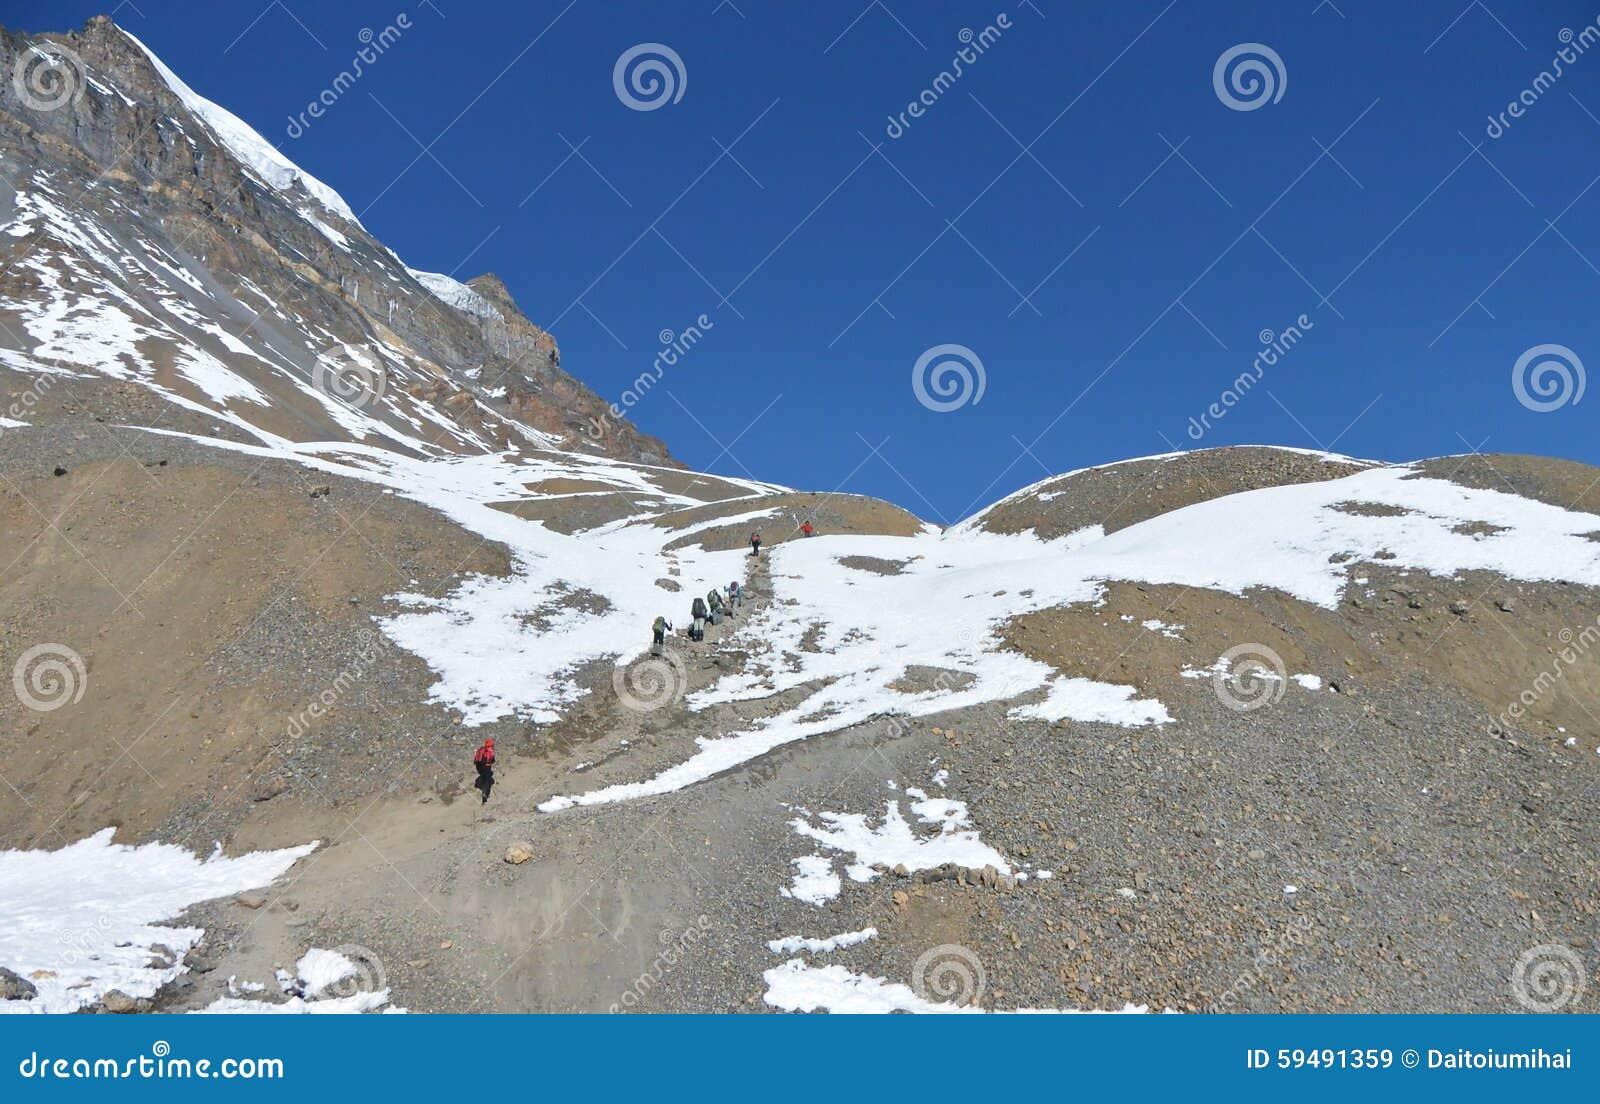 Thorung La pass to Daulagiri mountain. Annapurna trek, Himalaya mountains.